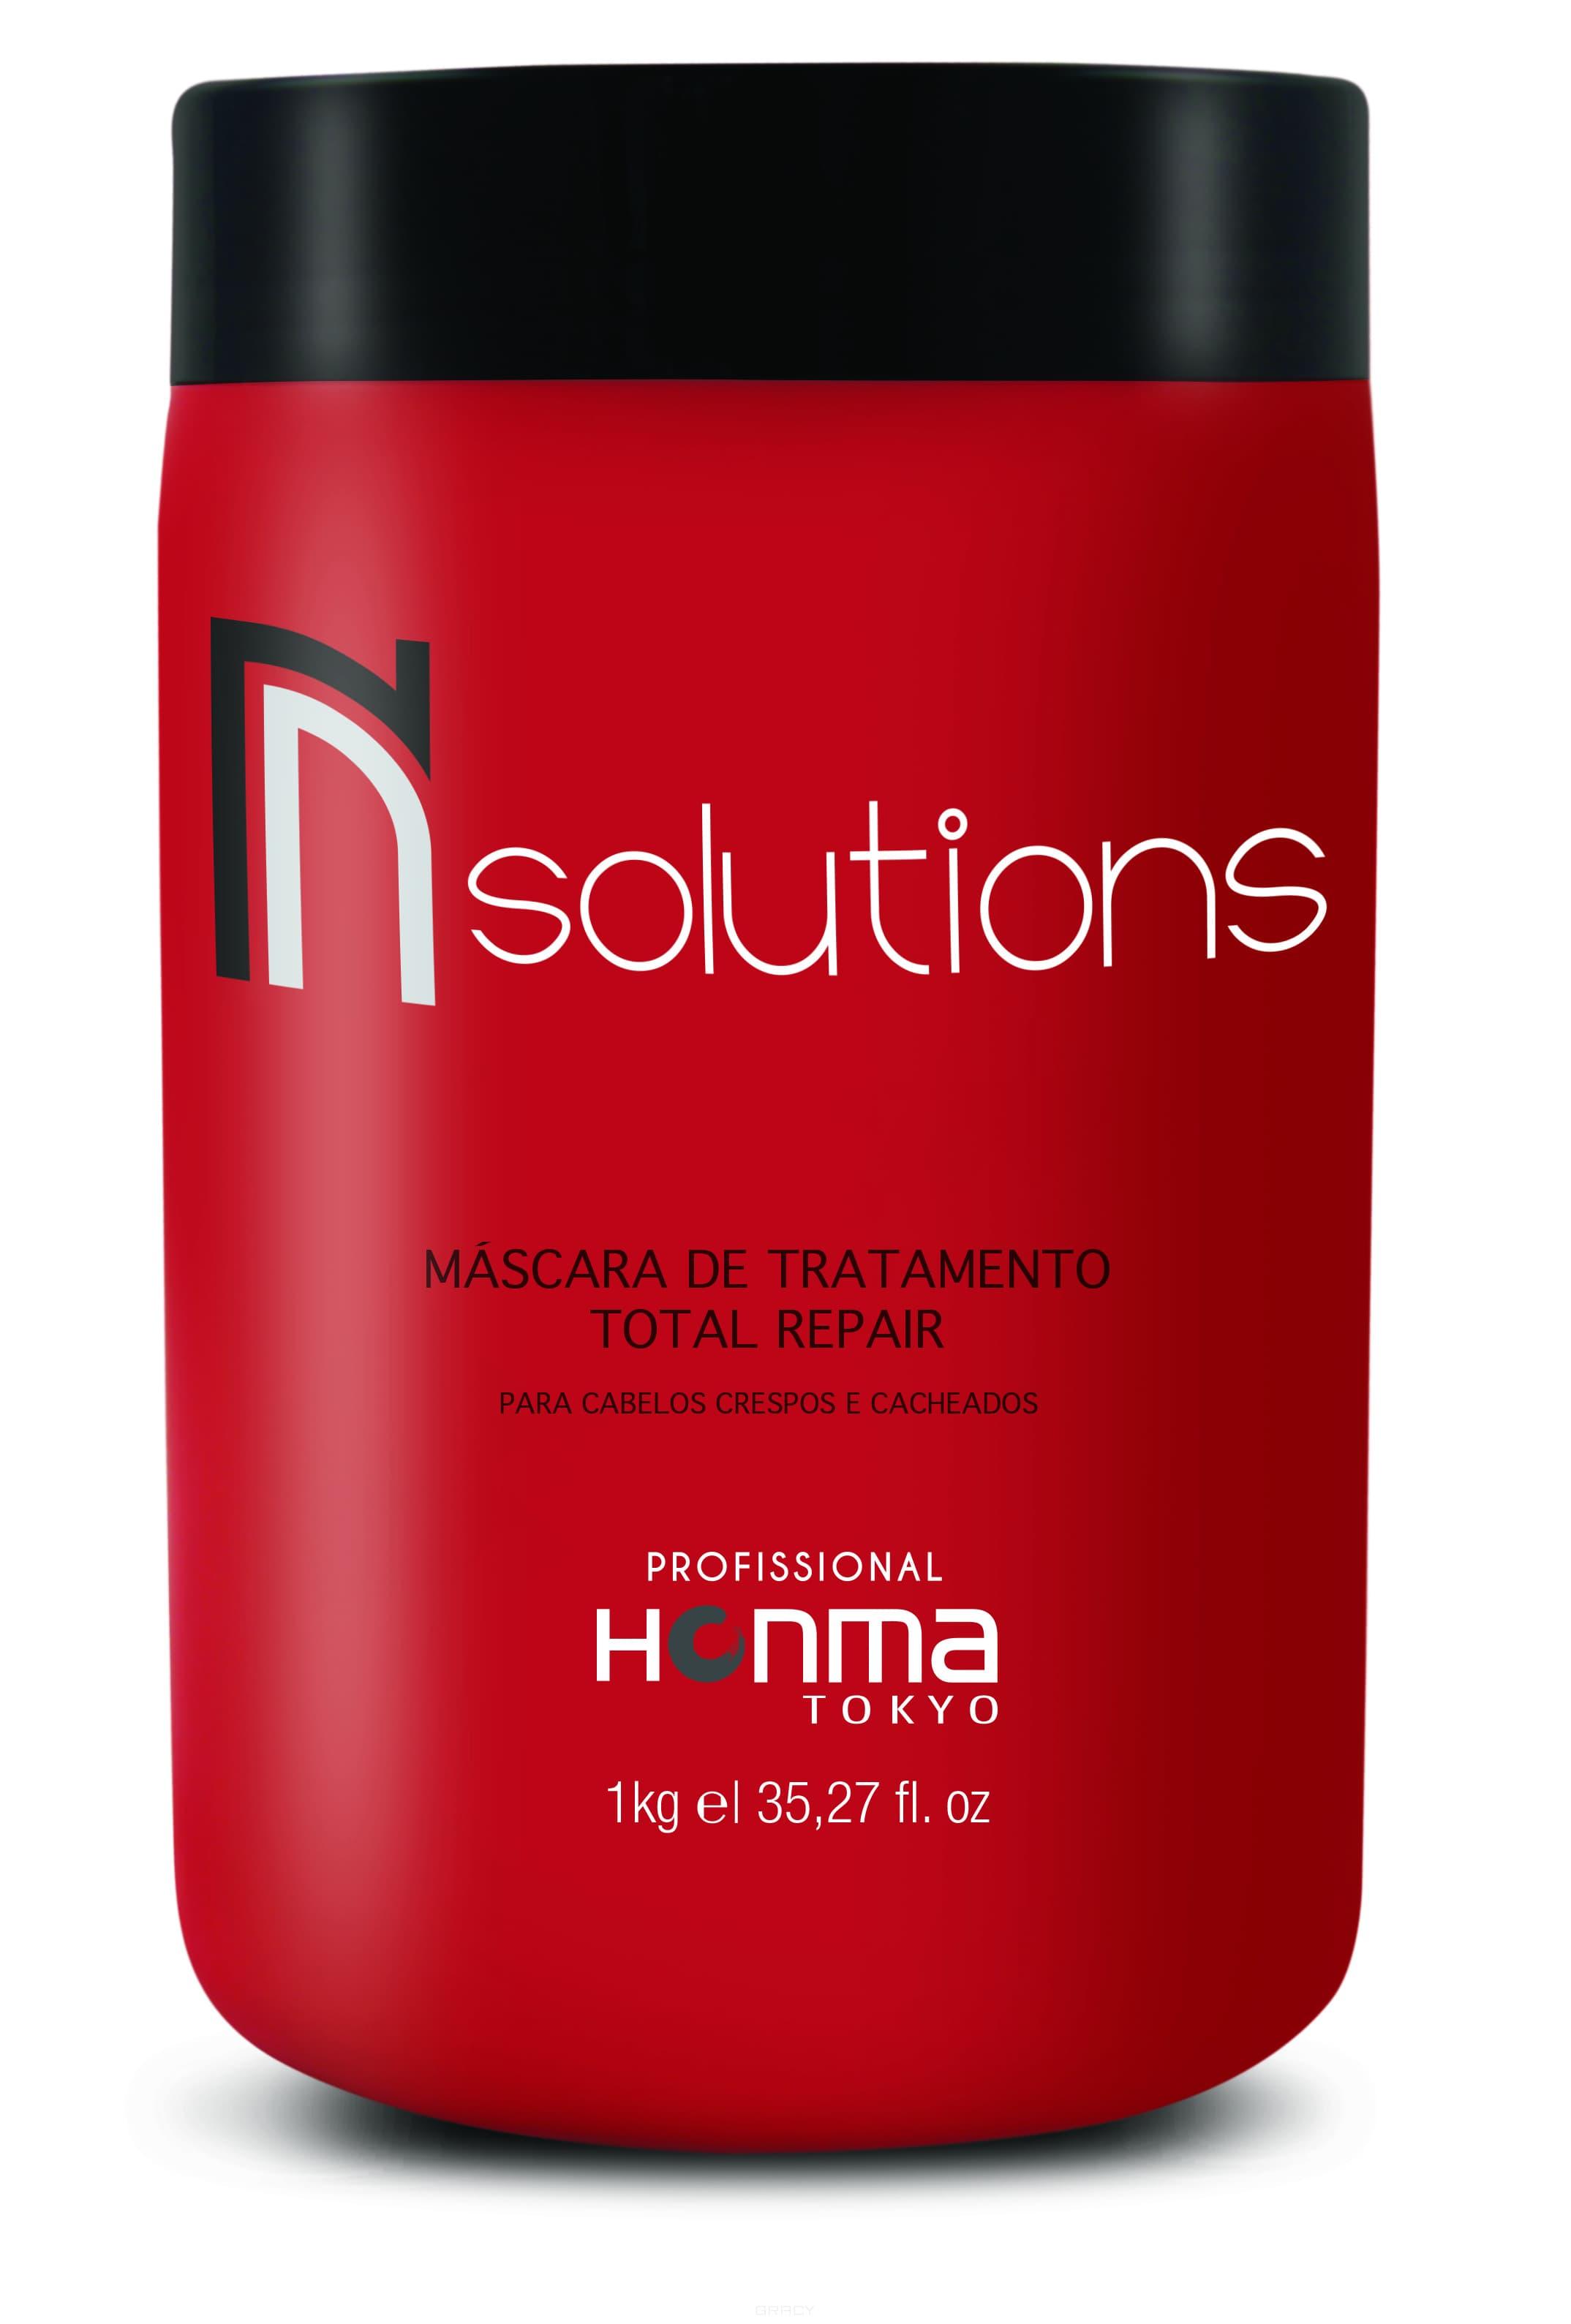 Honma Tokyo Интенсивный увлажняющий бальзам «N-Solutions», 1000 гр., 2. «МАСКА» Линии «N-Solutions», 1000 гр. environment science issues solutions